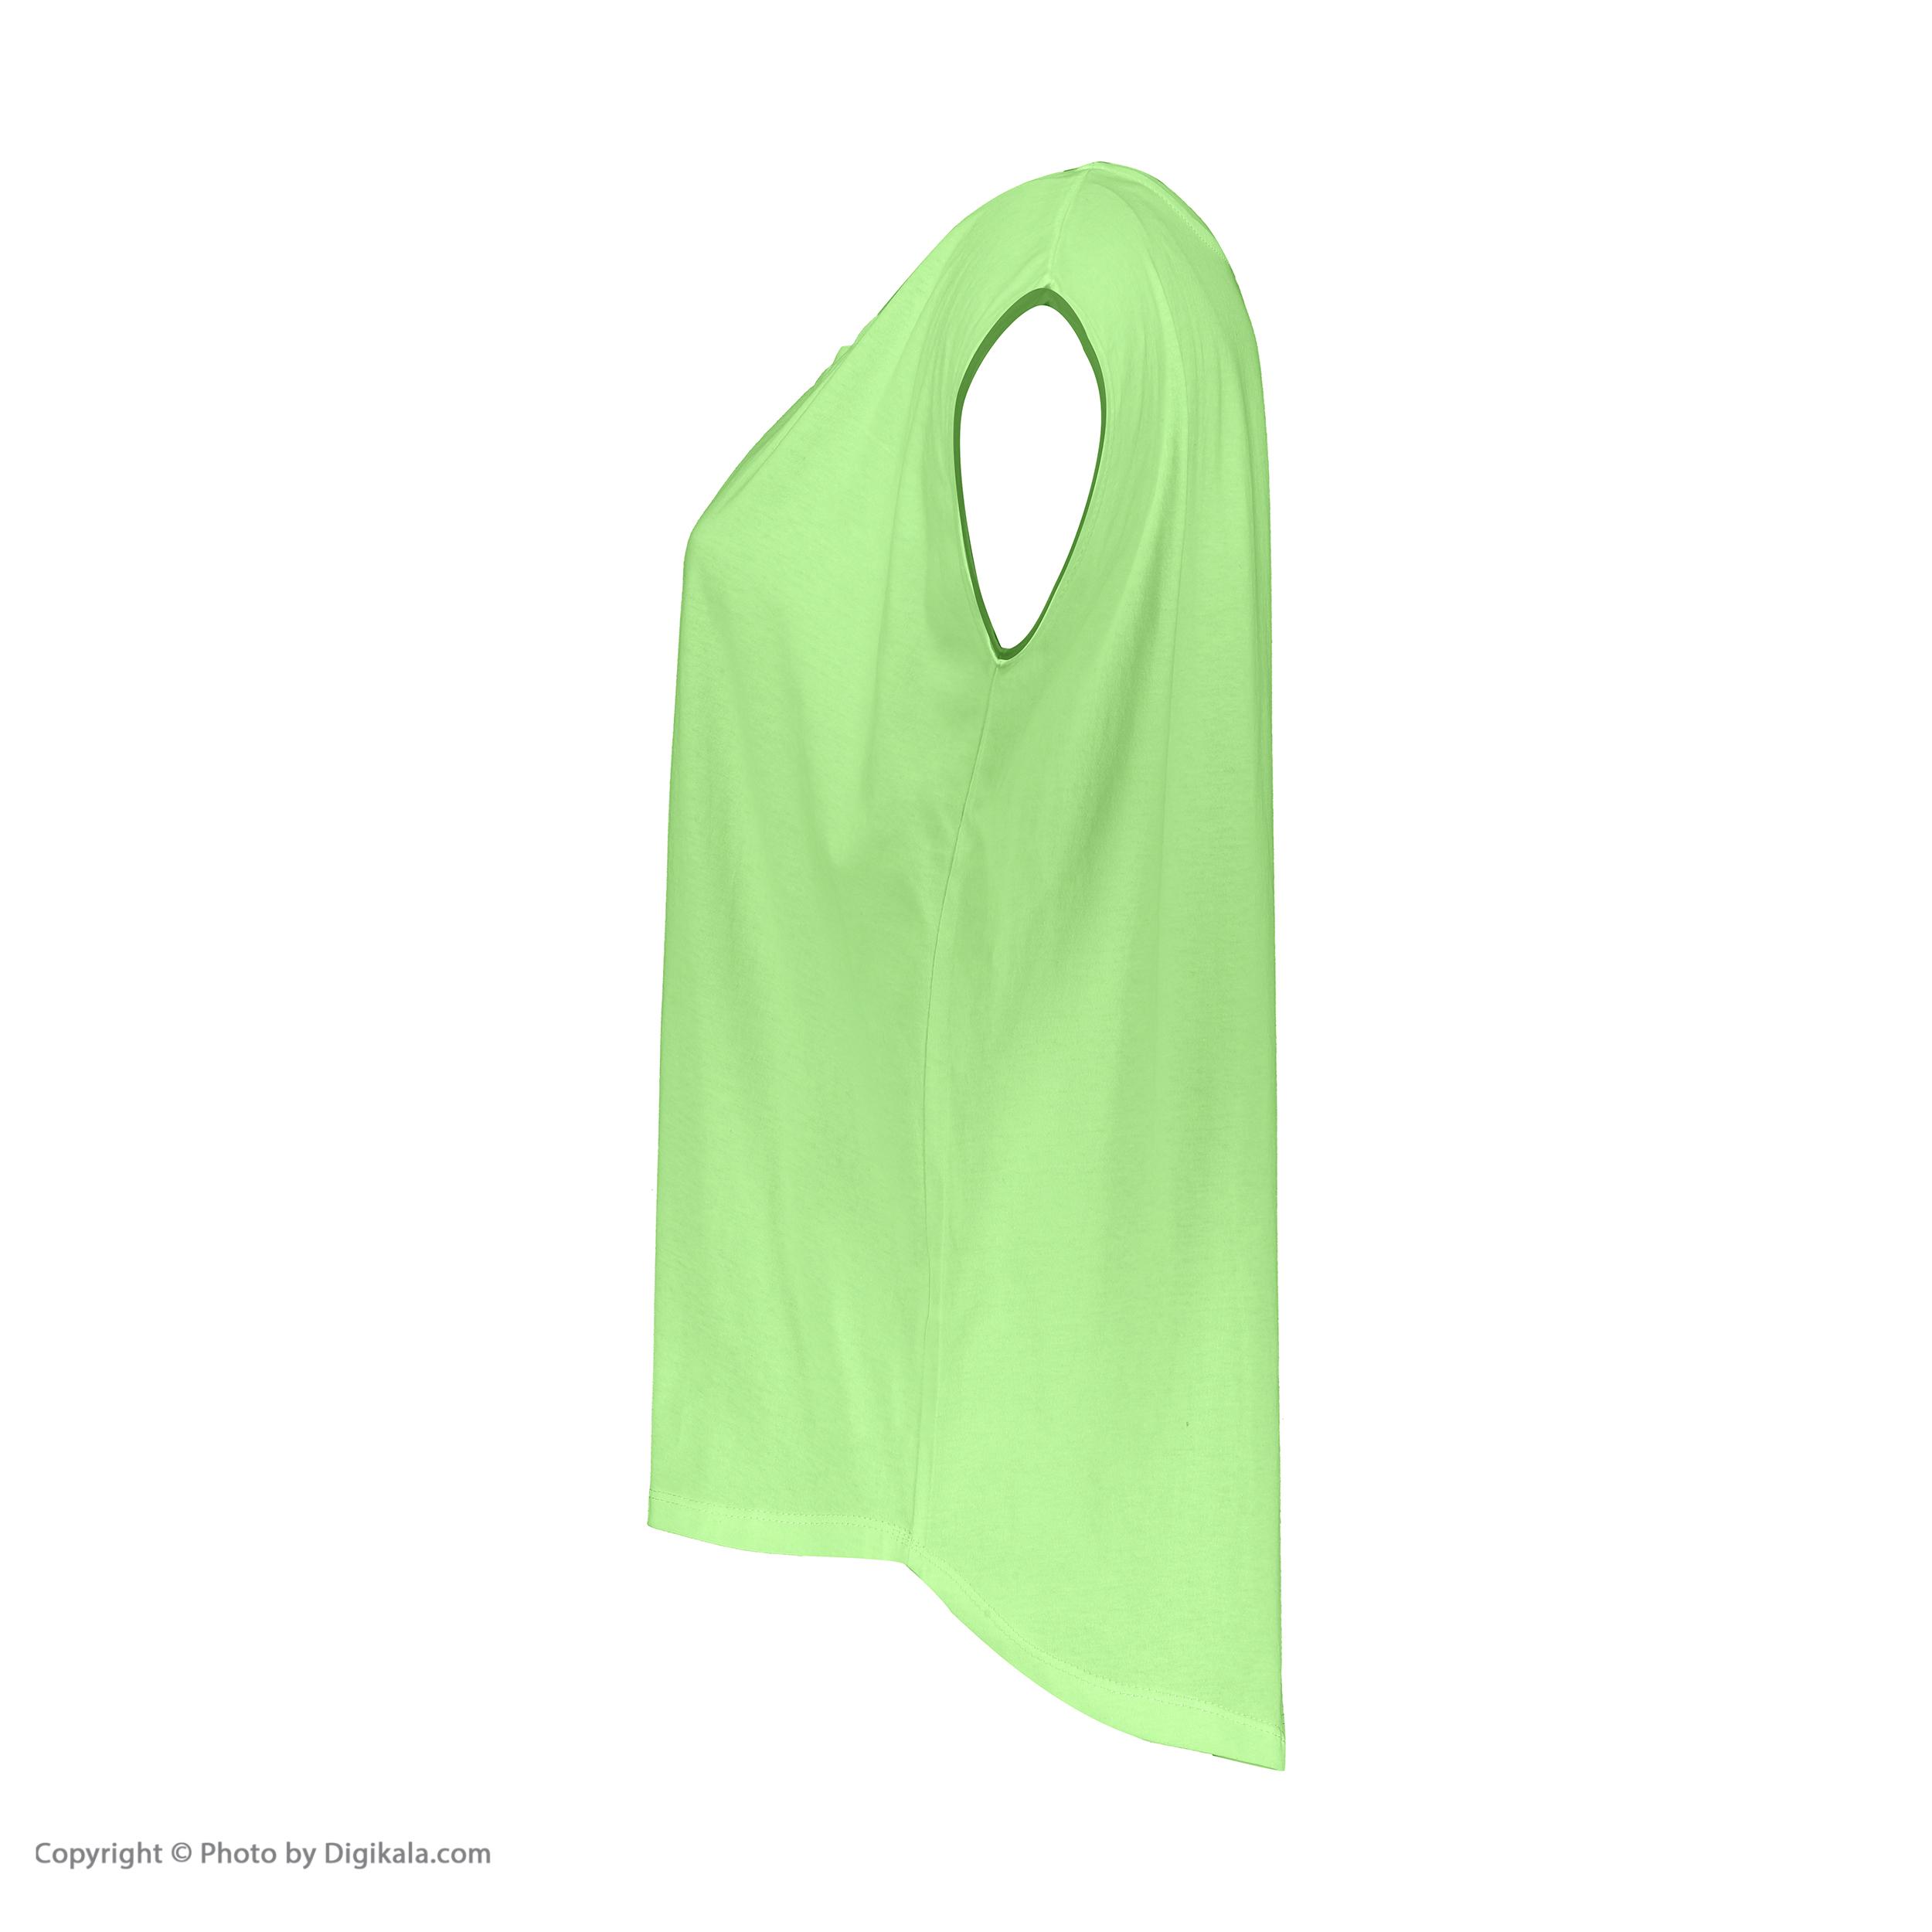 تی شرت زنانه آر ان اس مدل 1102049-43 -  - 3